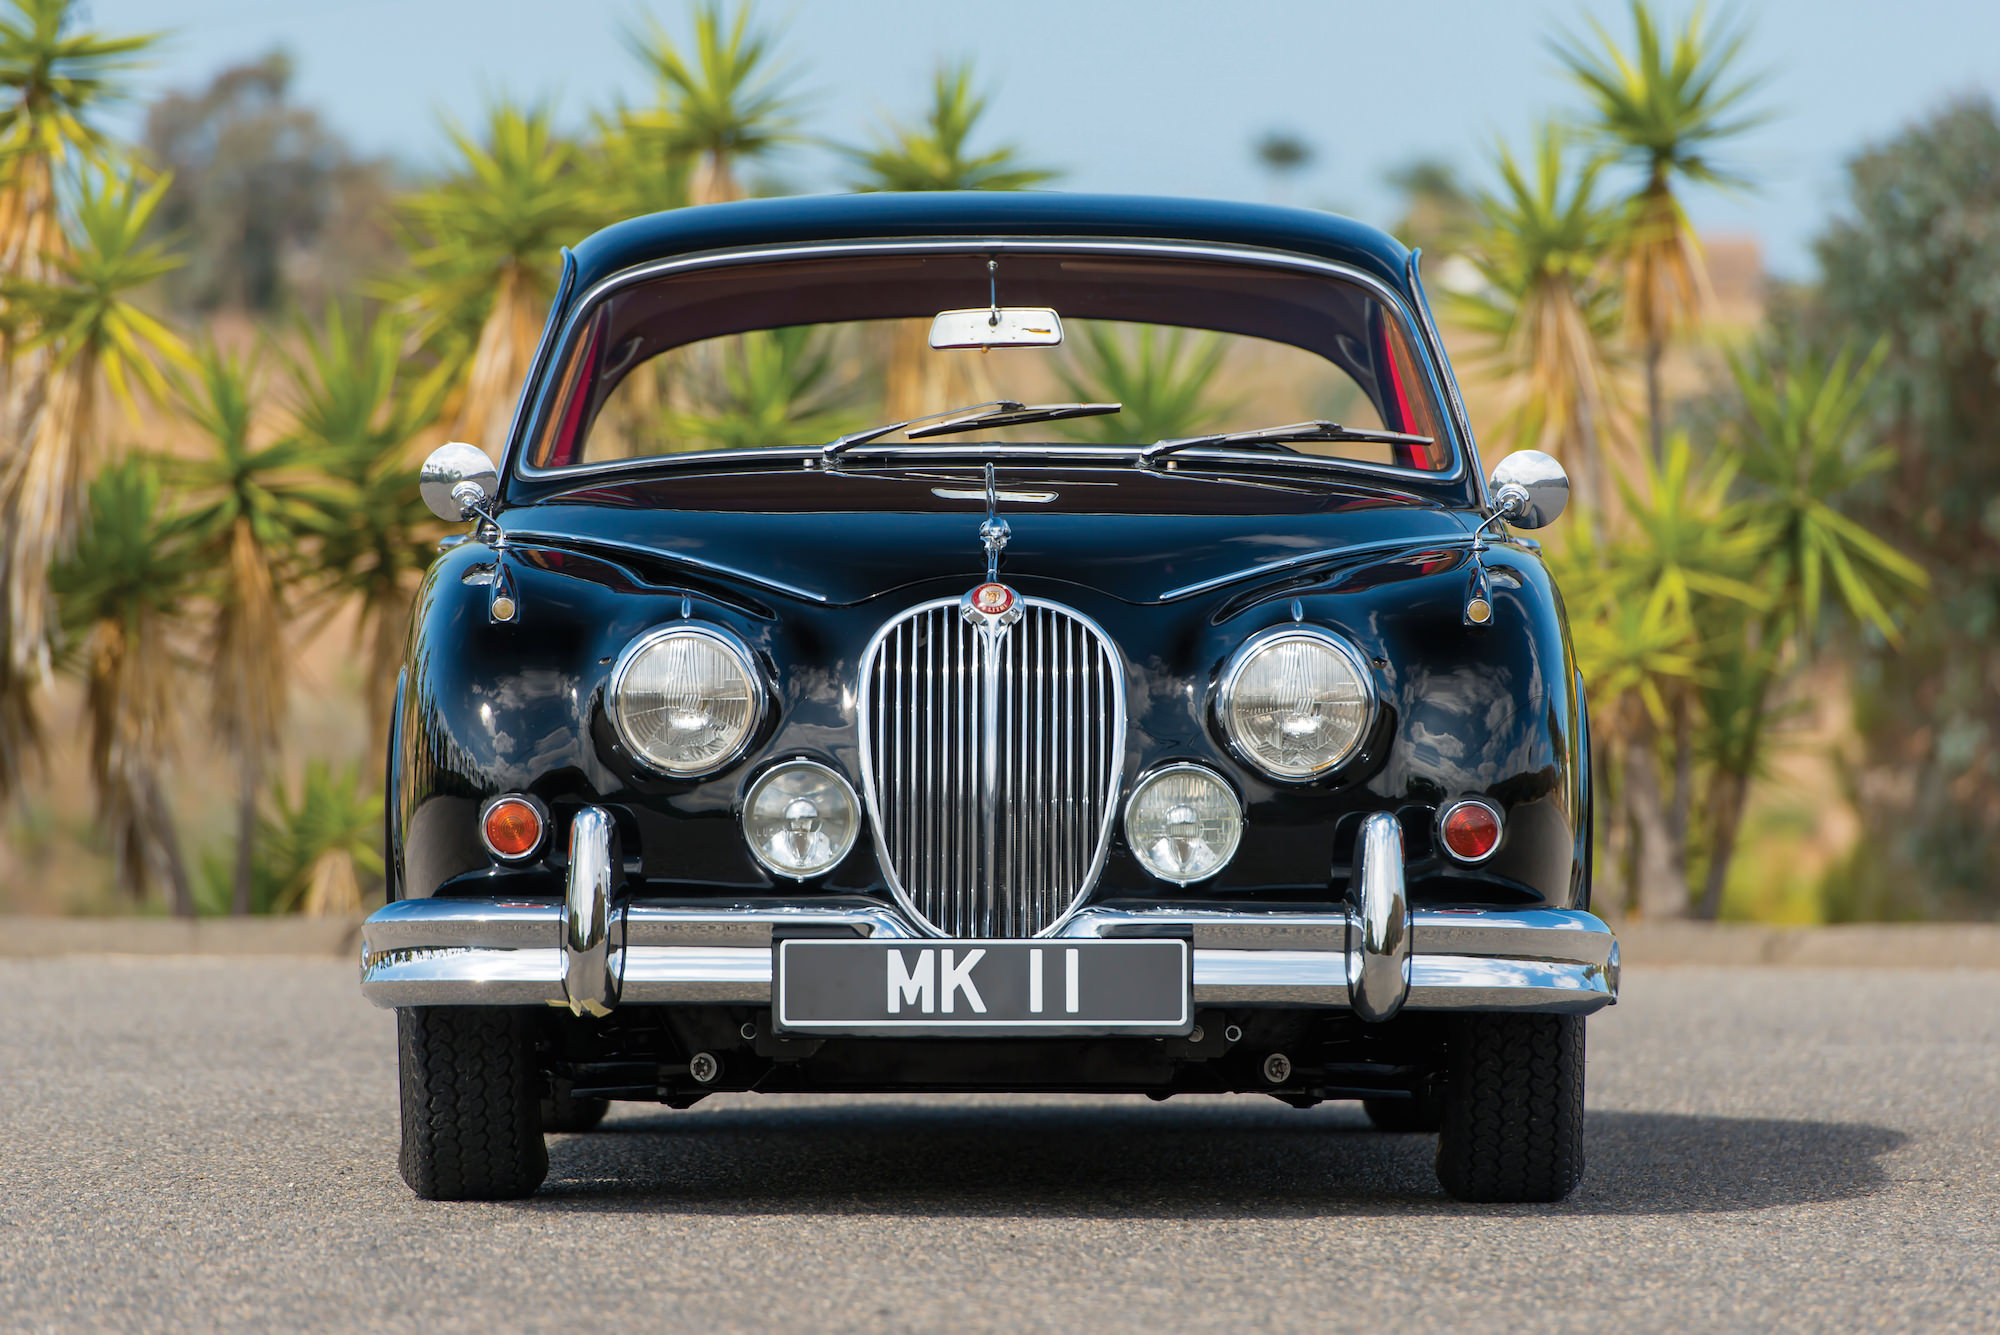 Fastest Car In The World 2015 >> Jaguar Mark II - The Original Gentleman's Getaway Car